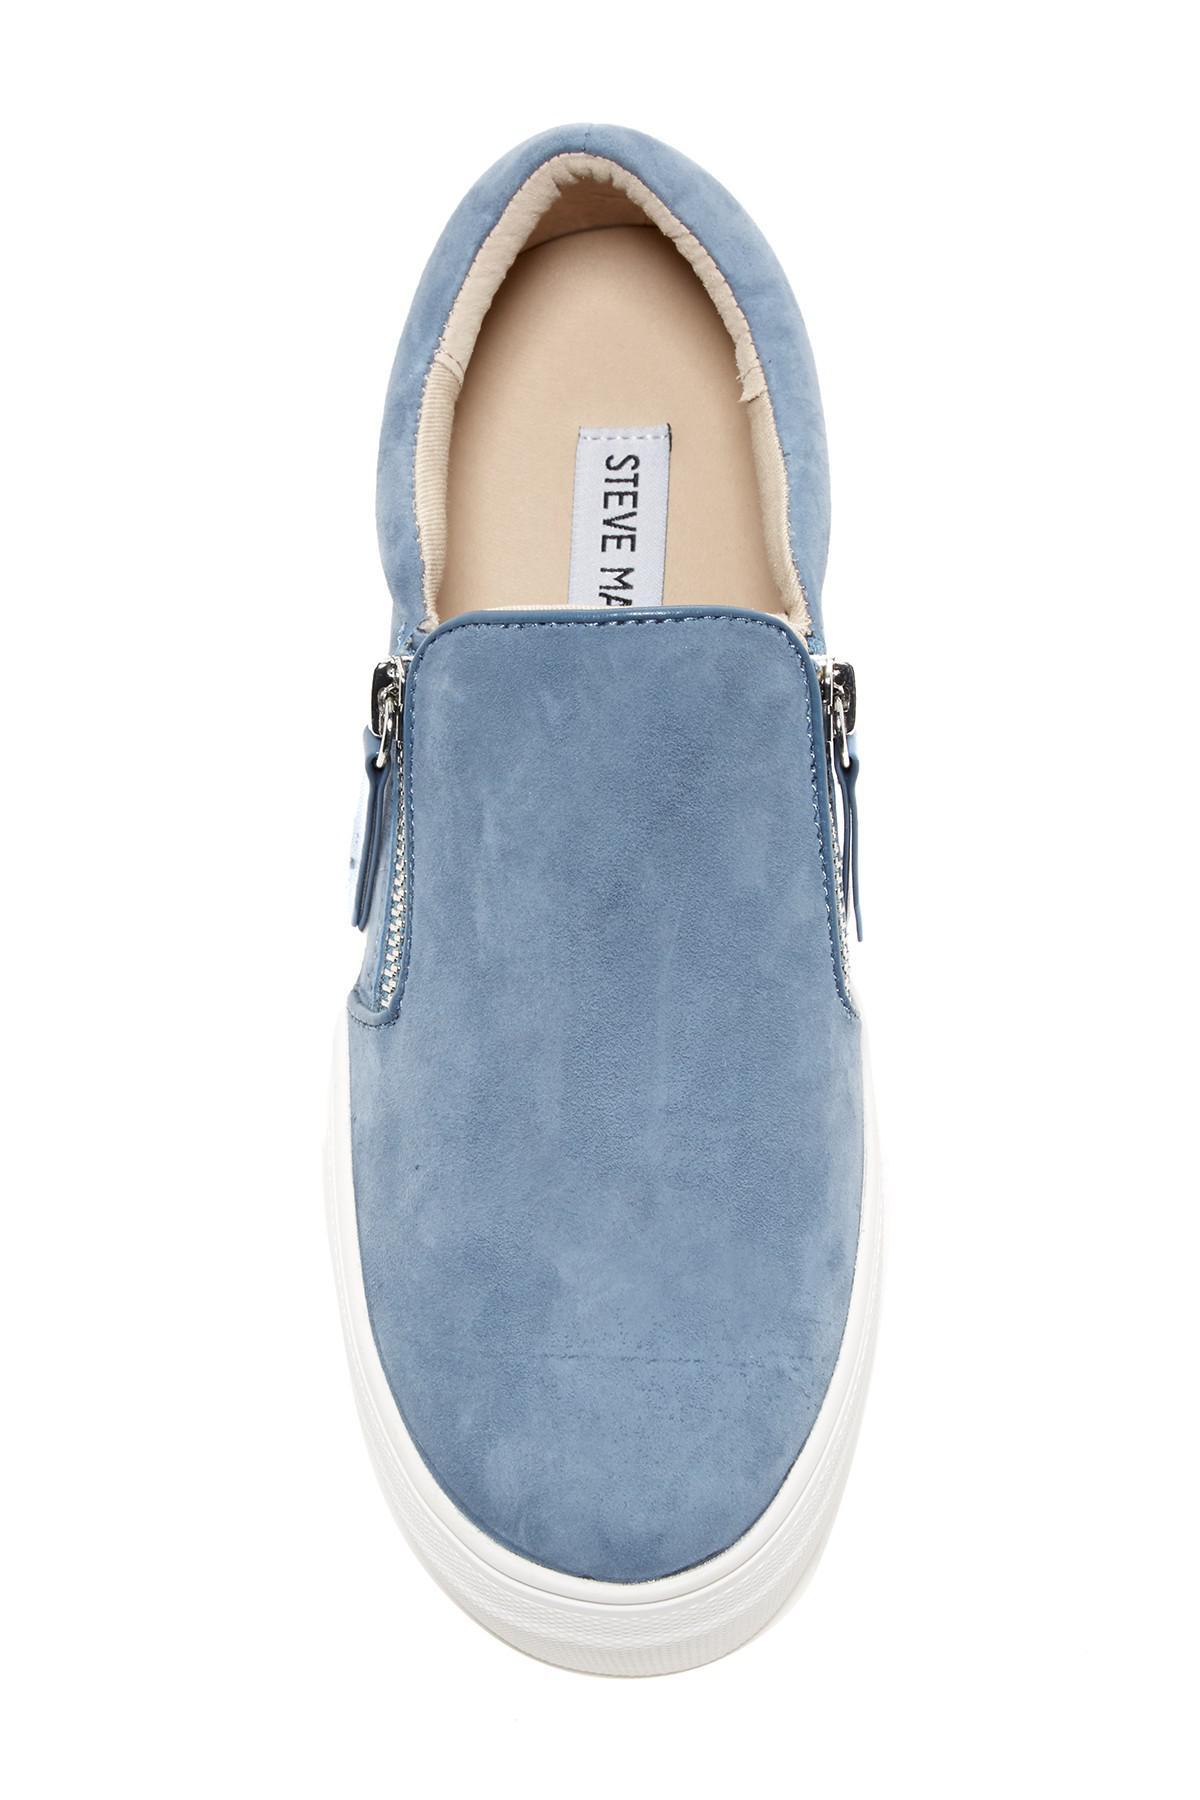 4cb07e6bd3d Lyst - Steve Madden Glaammar Zip Embossed Sneaker in Blue